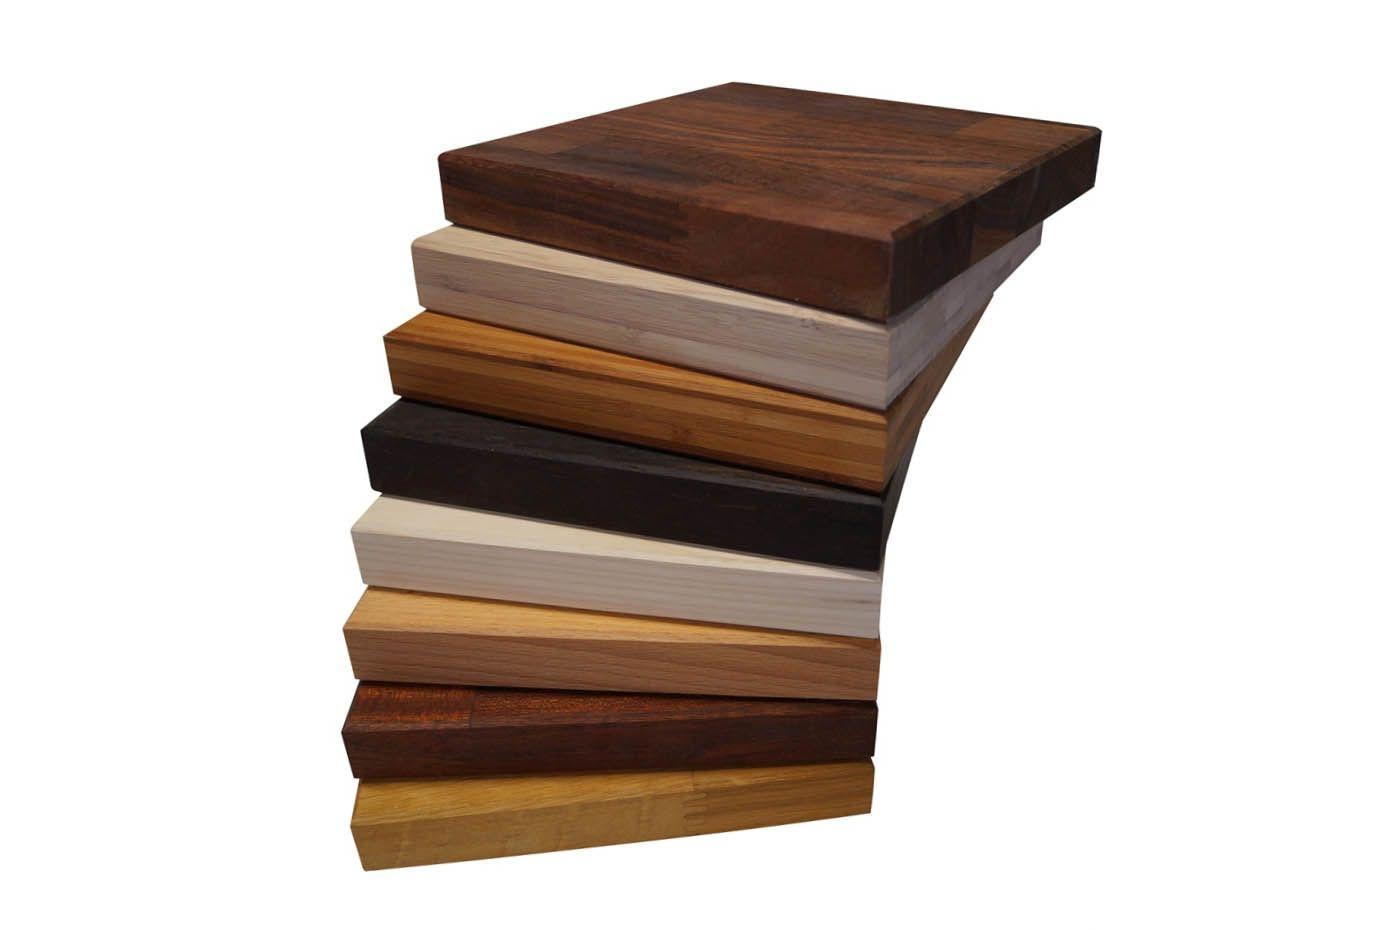 Fantastisk Træplader på mål | Krydsfiner, MDF, linoleum, OSB BG91